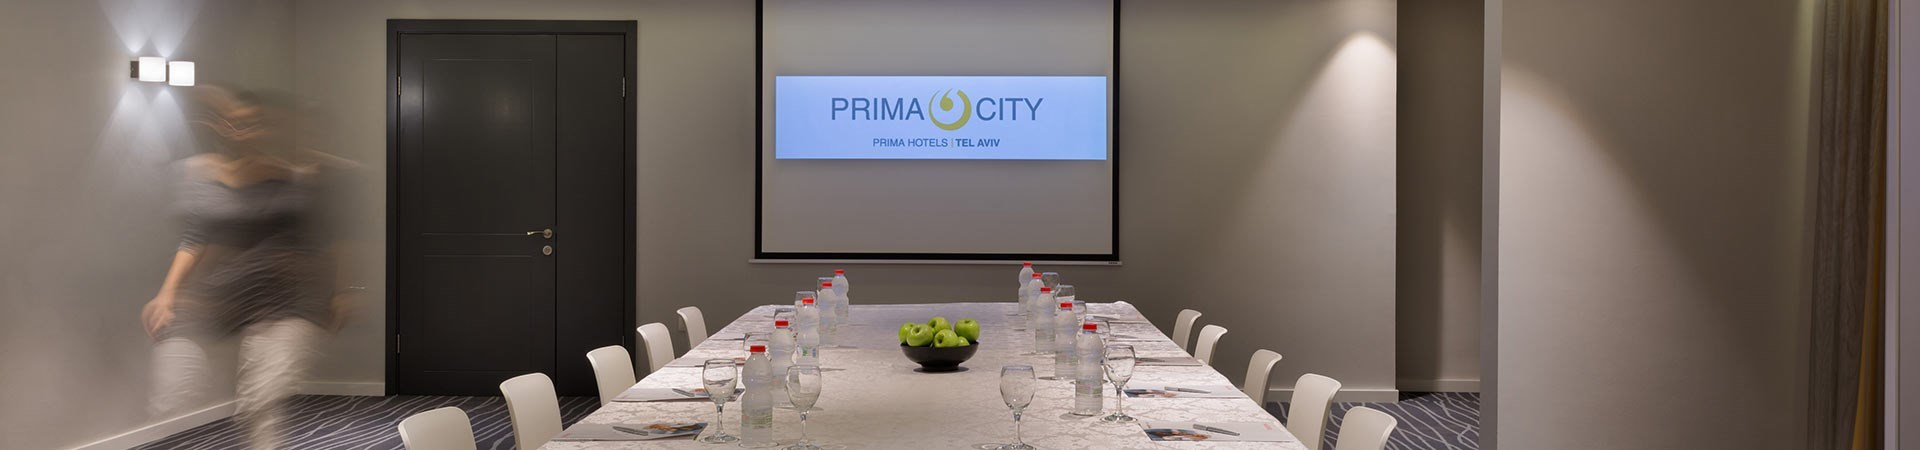 prima-city-app-meeting-room-1-1-